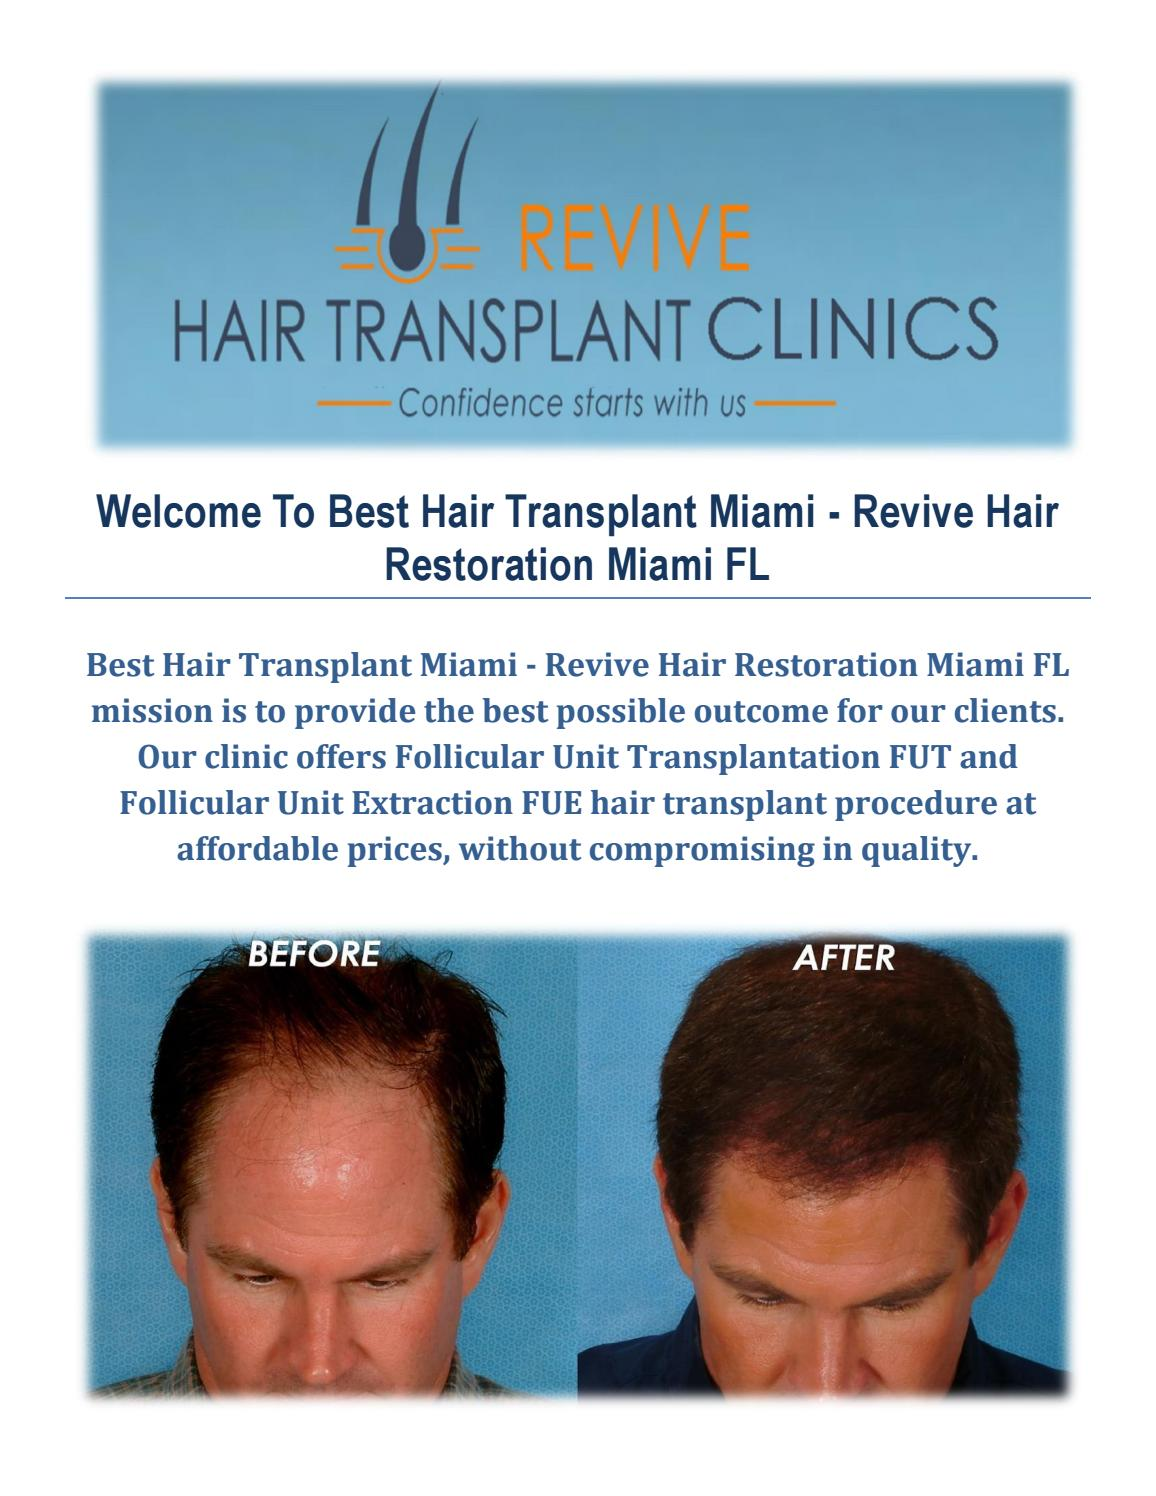 Best Hair Transplant in Miami FL - Revive Hair Restoration